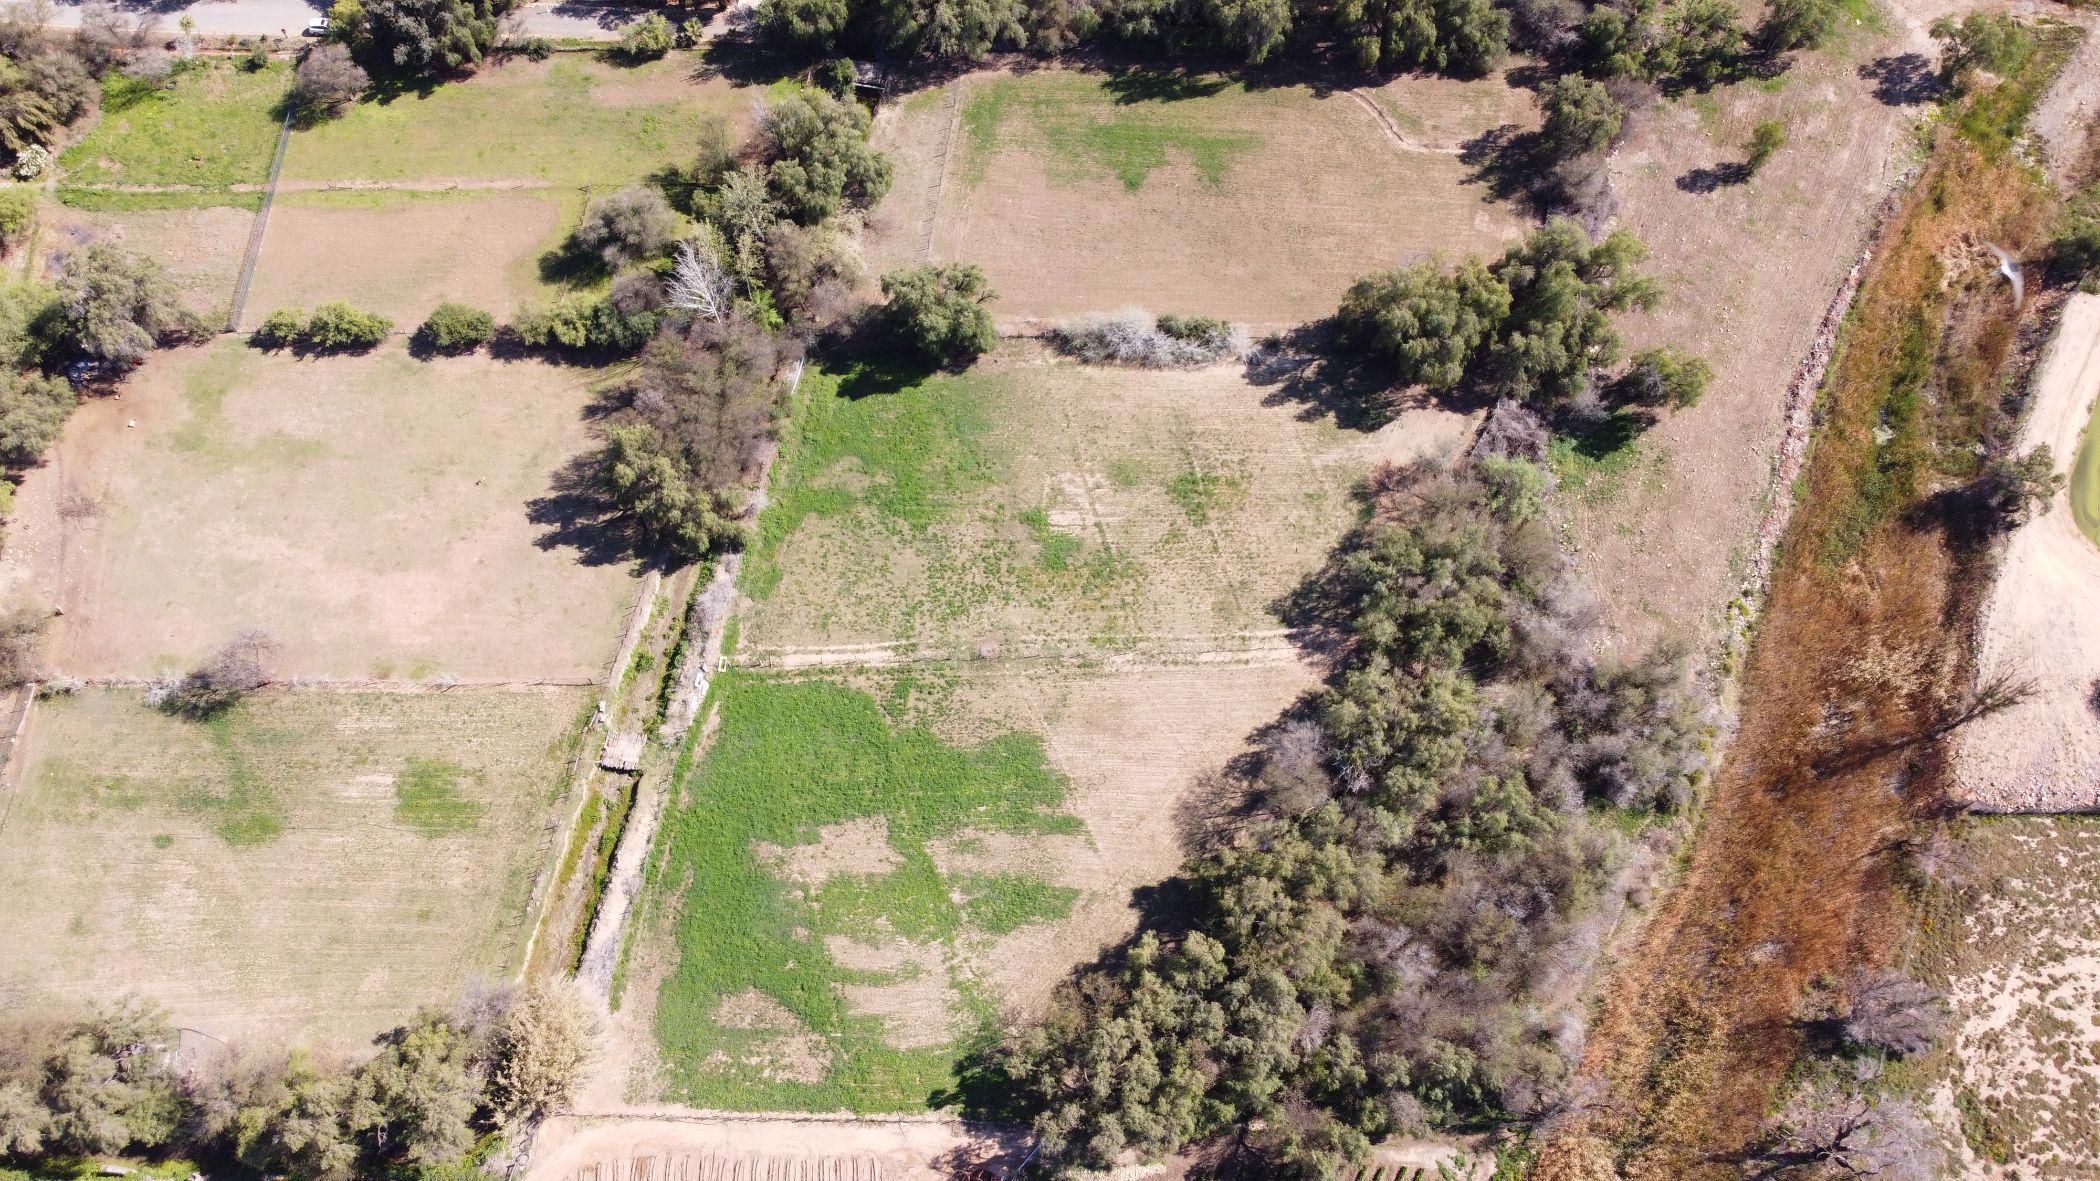 9635 m² vacant land for sale in West Bank (Oudtshoorn)